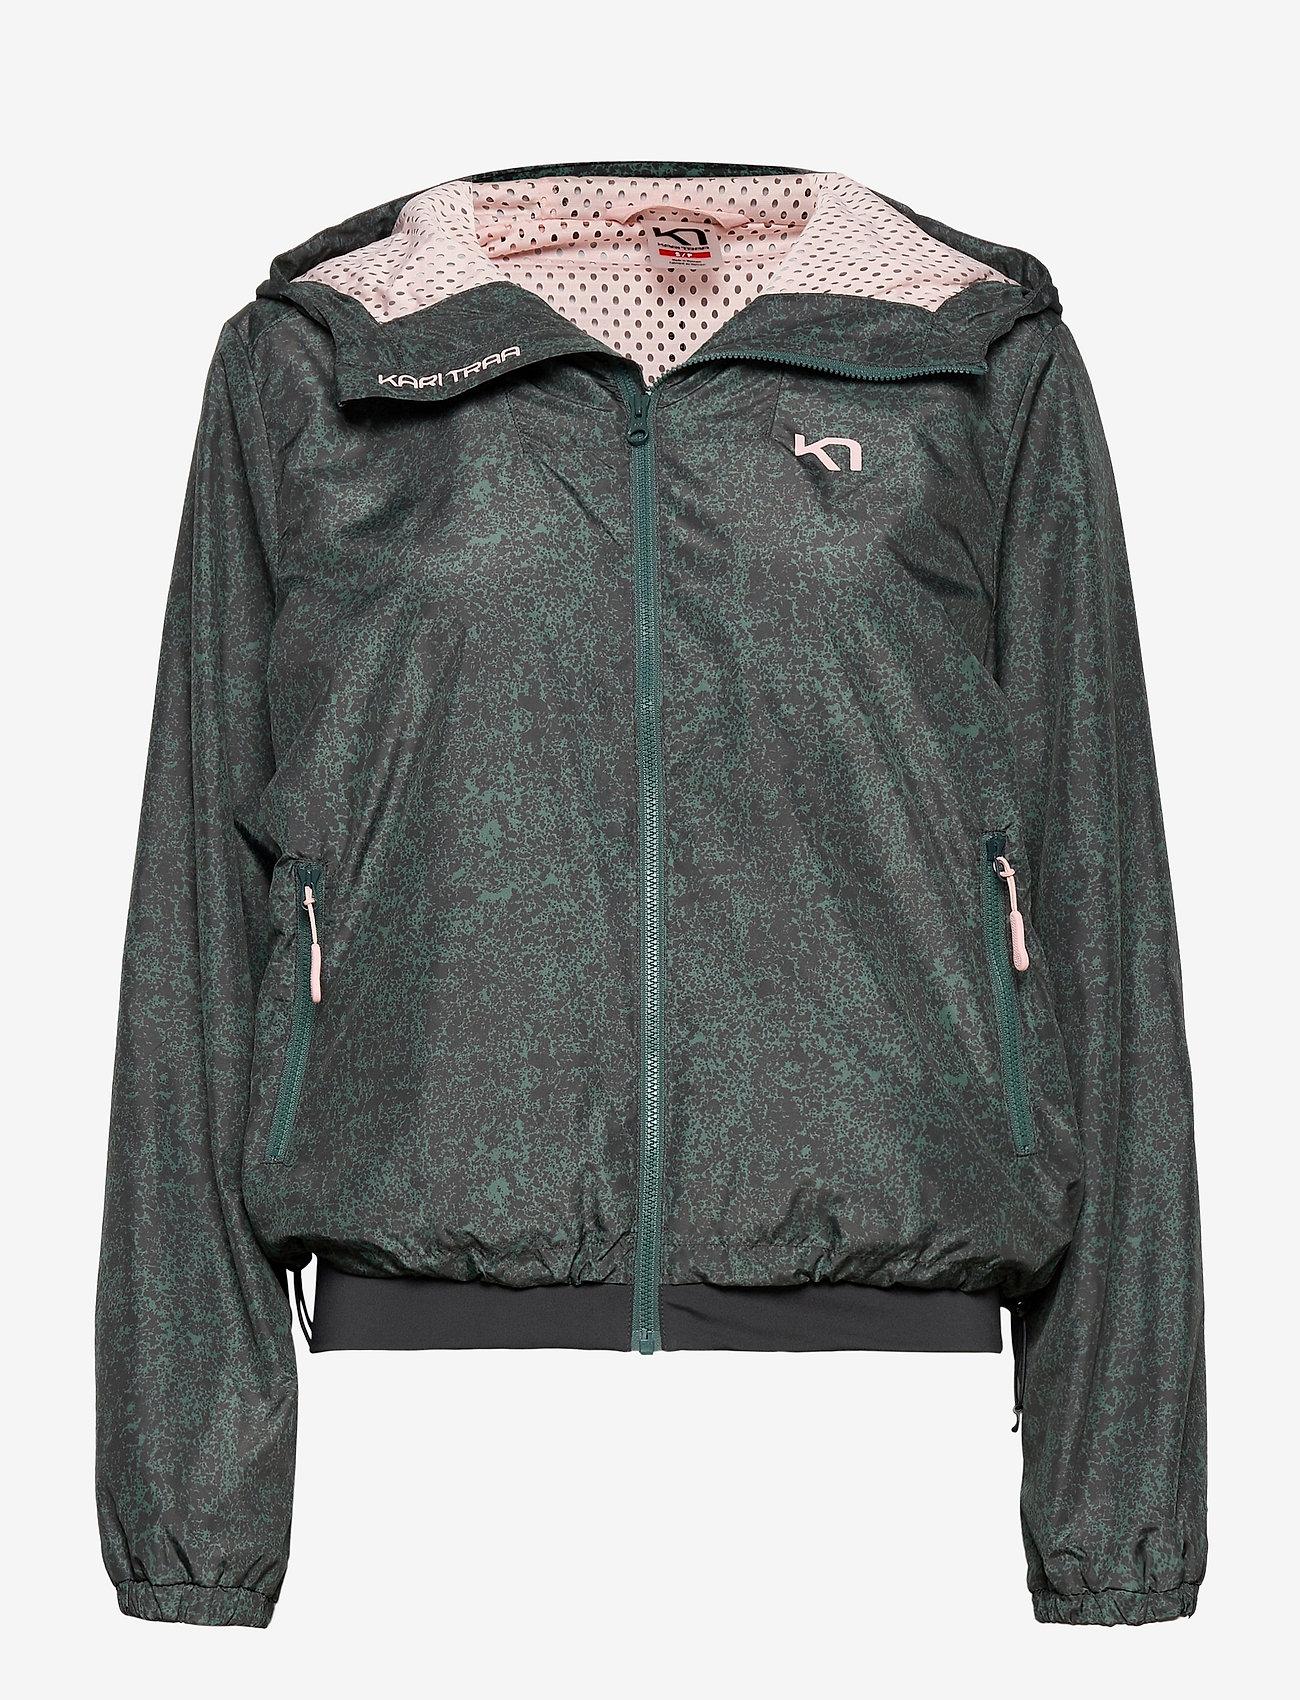 Kari Traa - ANE JACKET - training jackets - ivy - 0